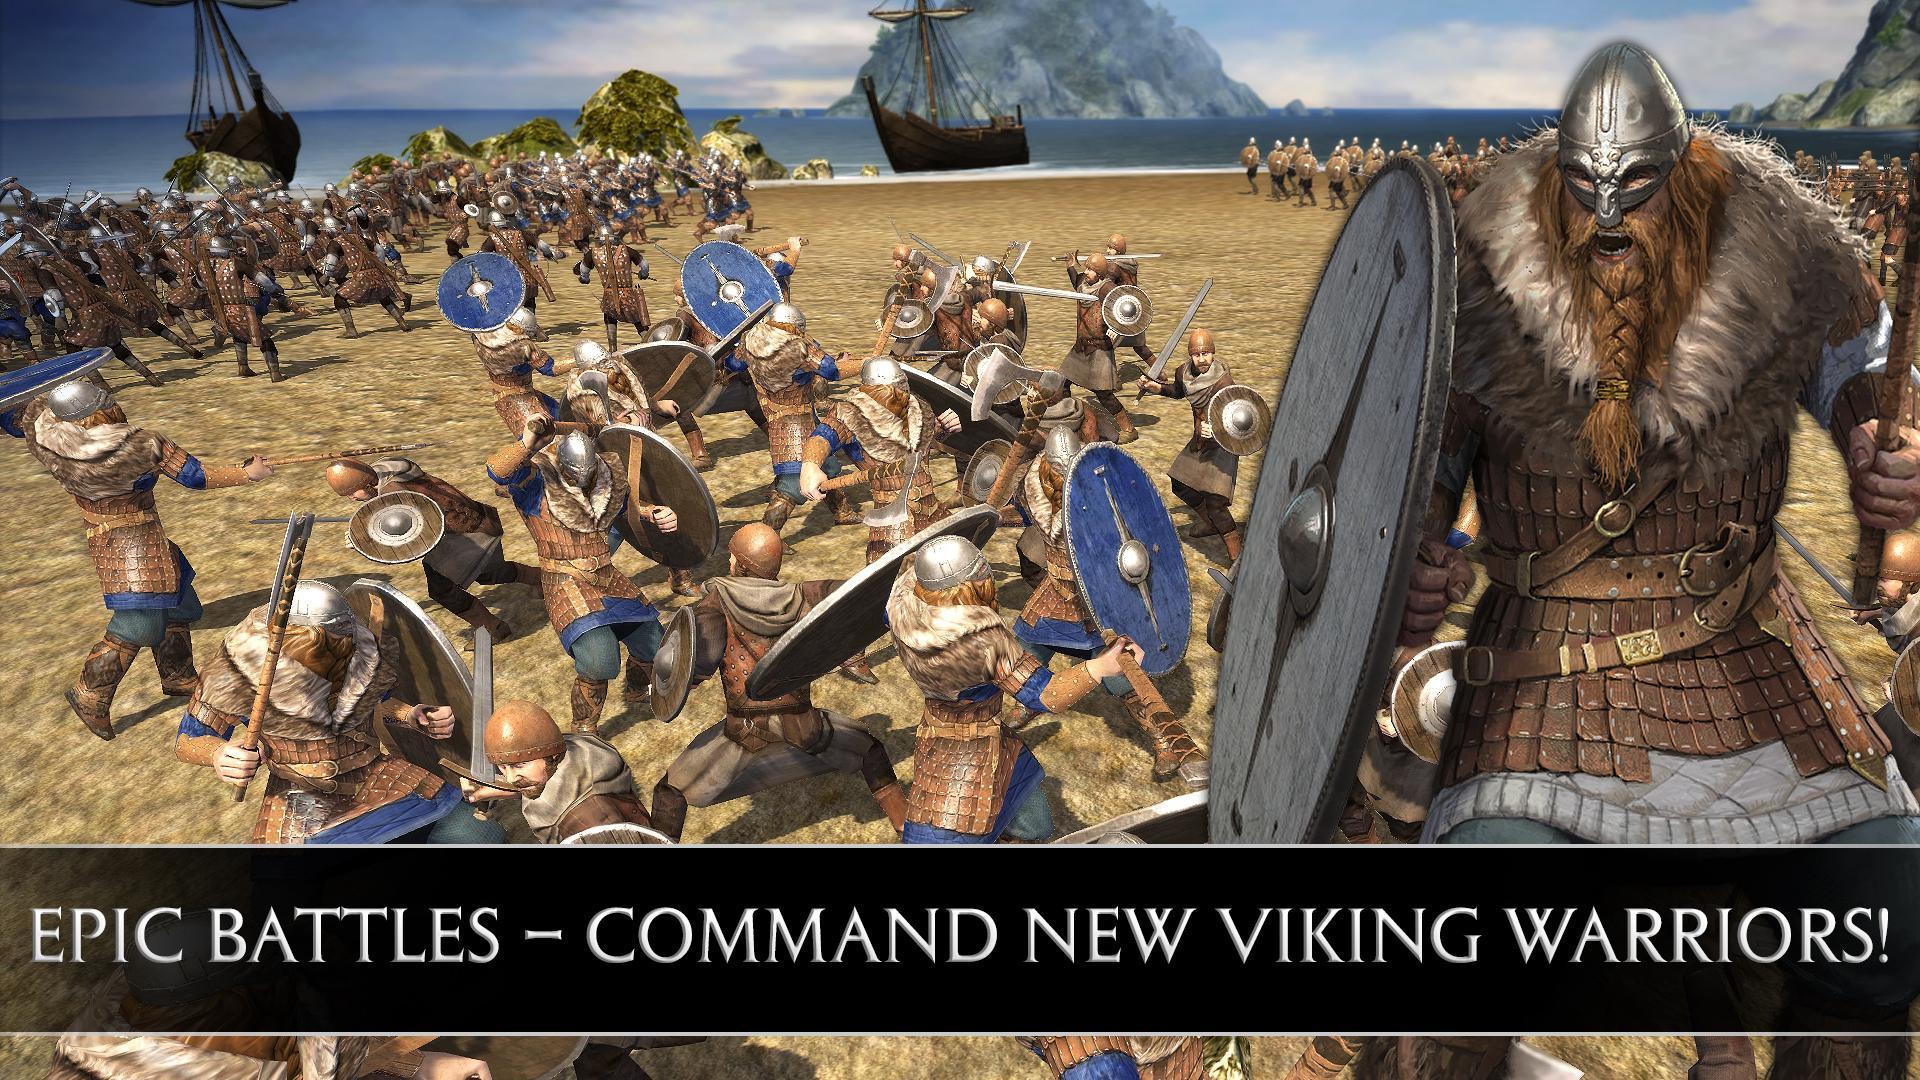 Total War Battles: KINGDOM - Strategy RPG 1.30 Screenshot 6